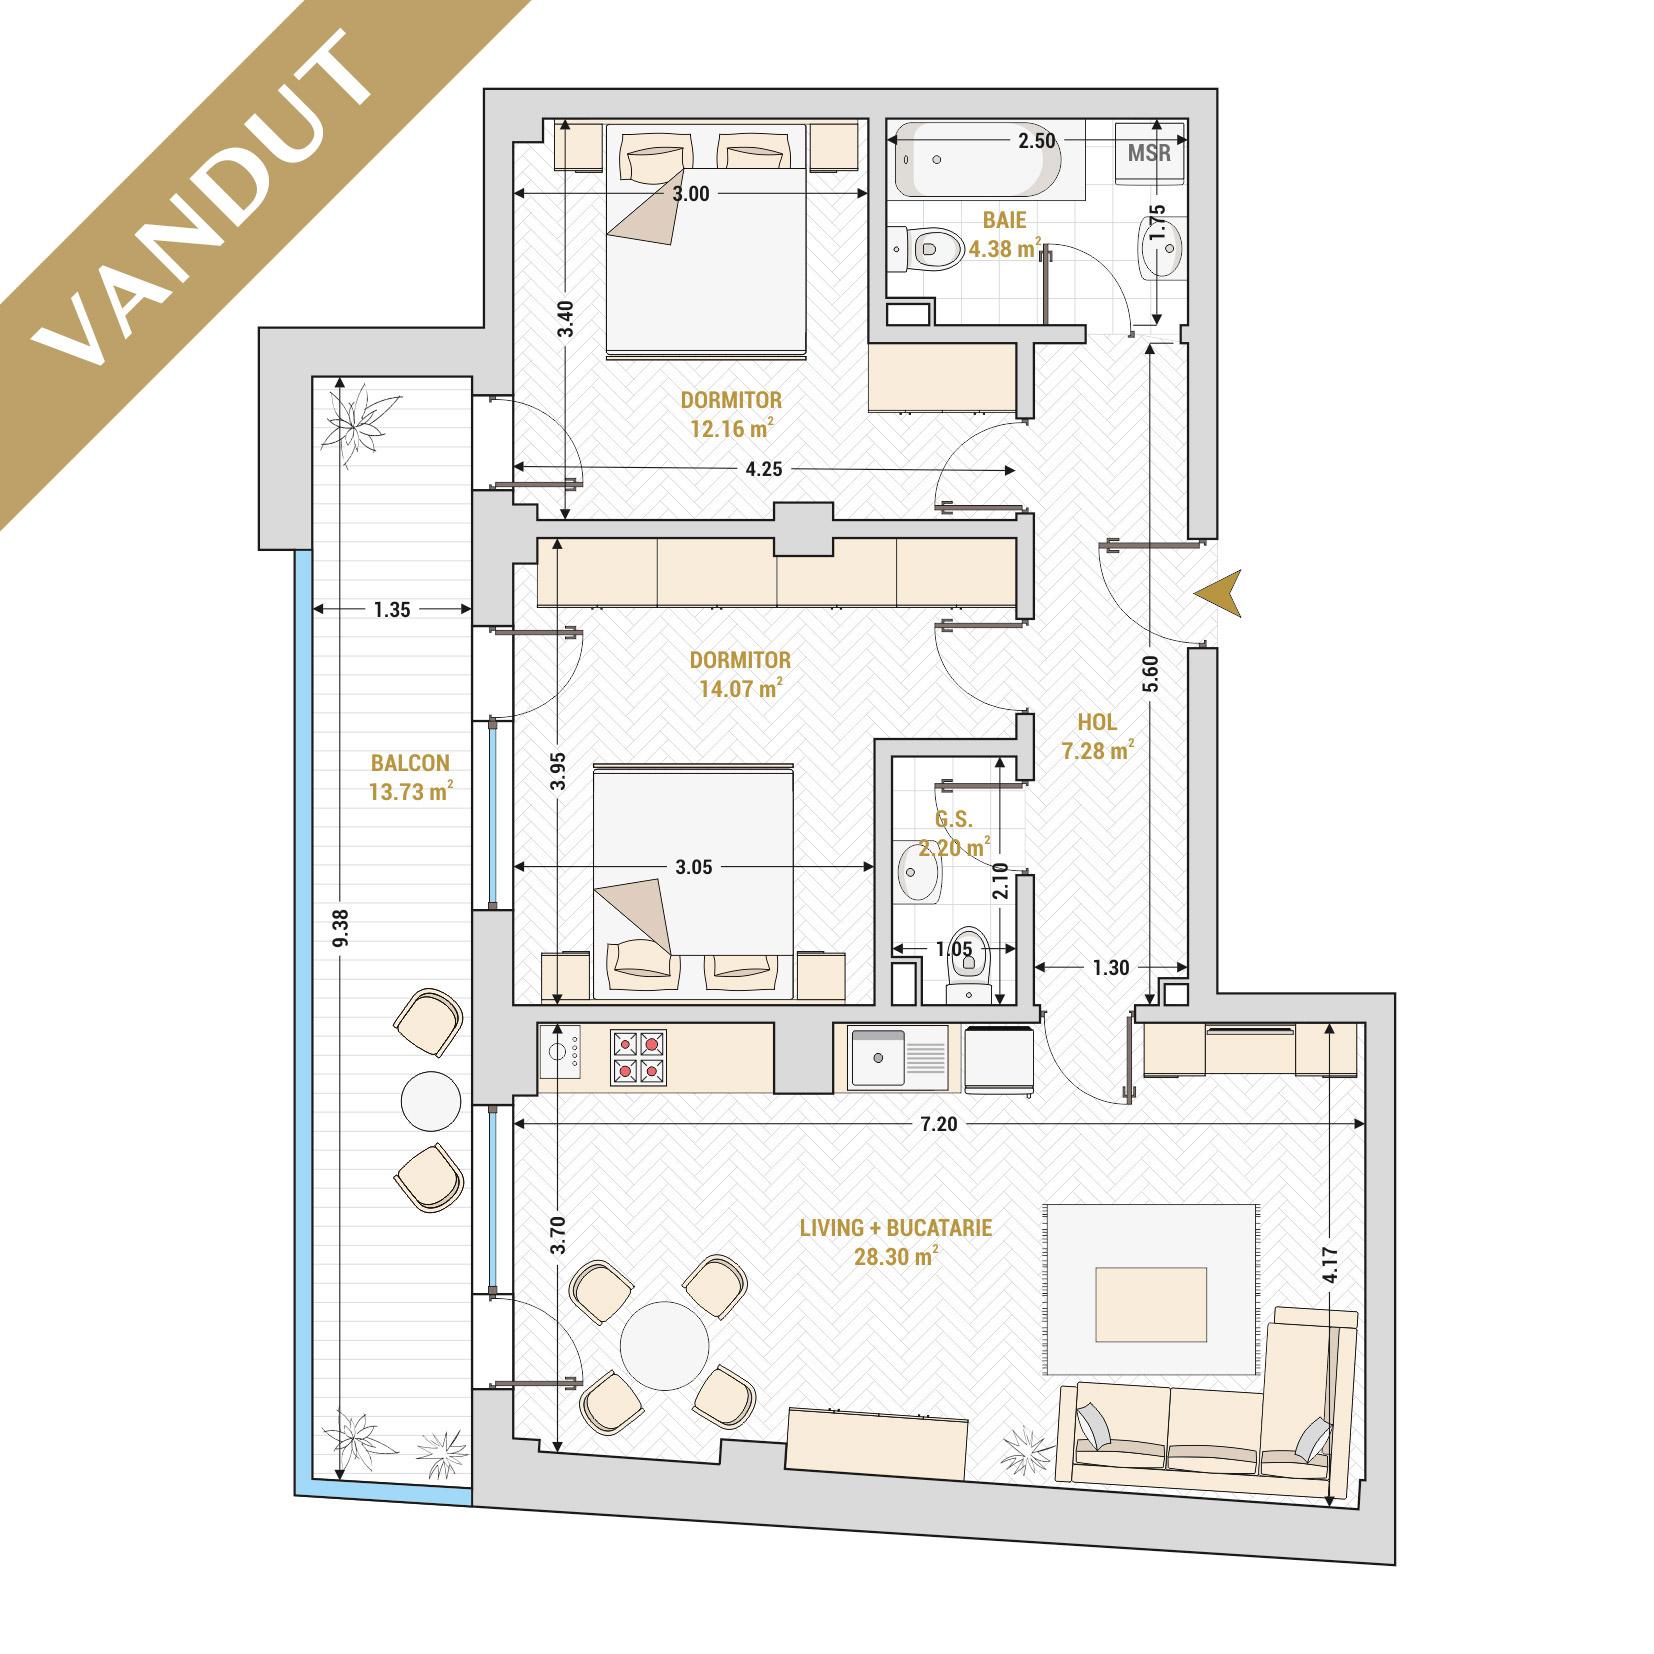 Apartament 3 camere de vanzare Bucuresti - Catedral Residence - Marriott, Piata Unirii, 13 Septembrie, Izvor - Tip 4 - T2A - VANDUT